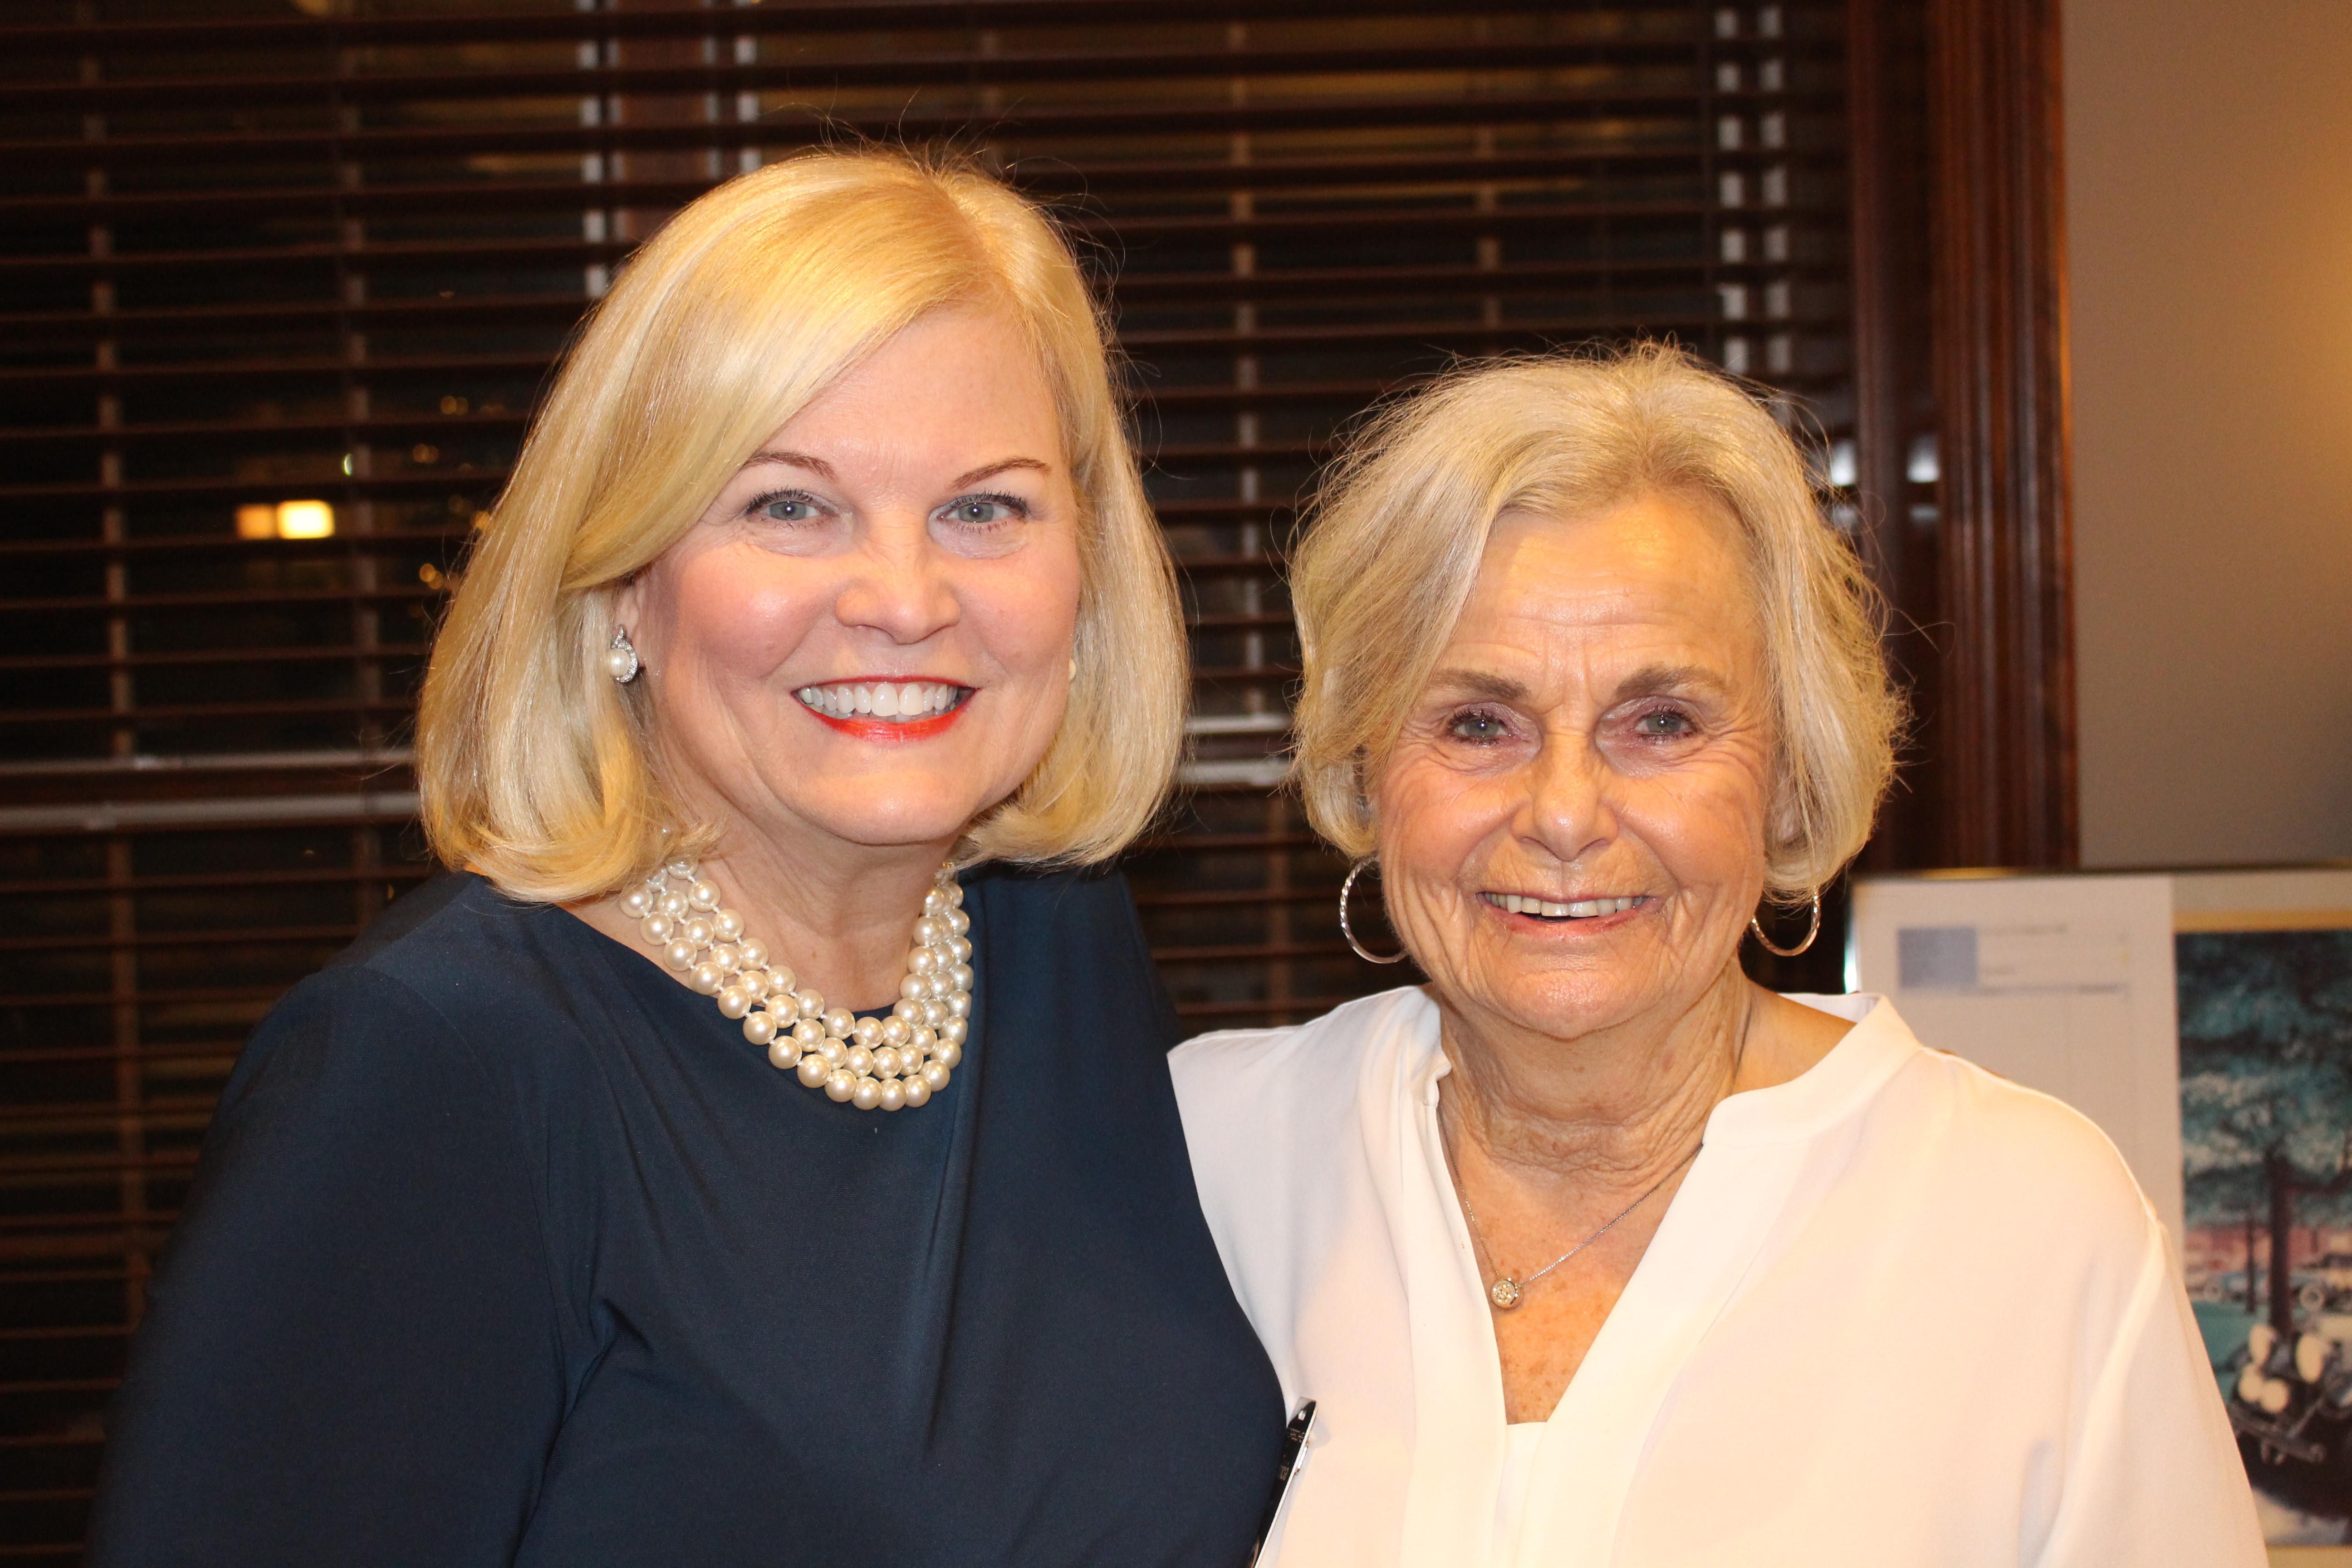 Joanne Cumiskey & Patti Door